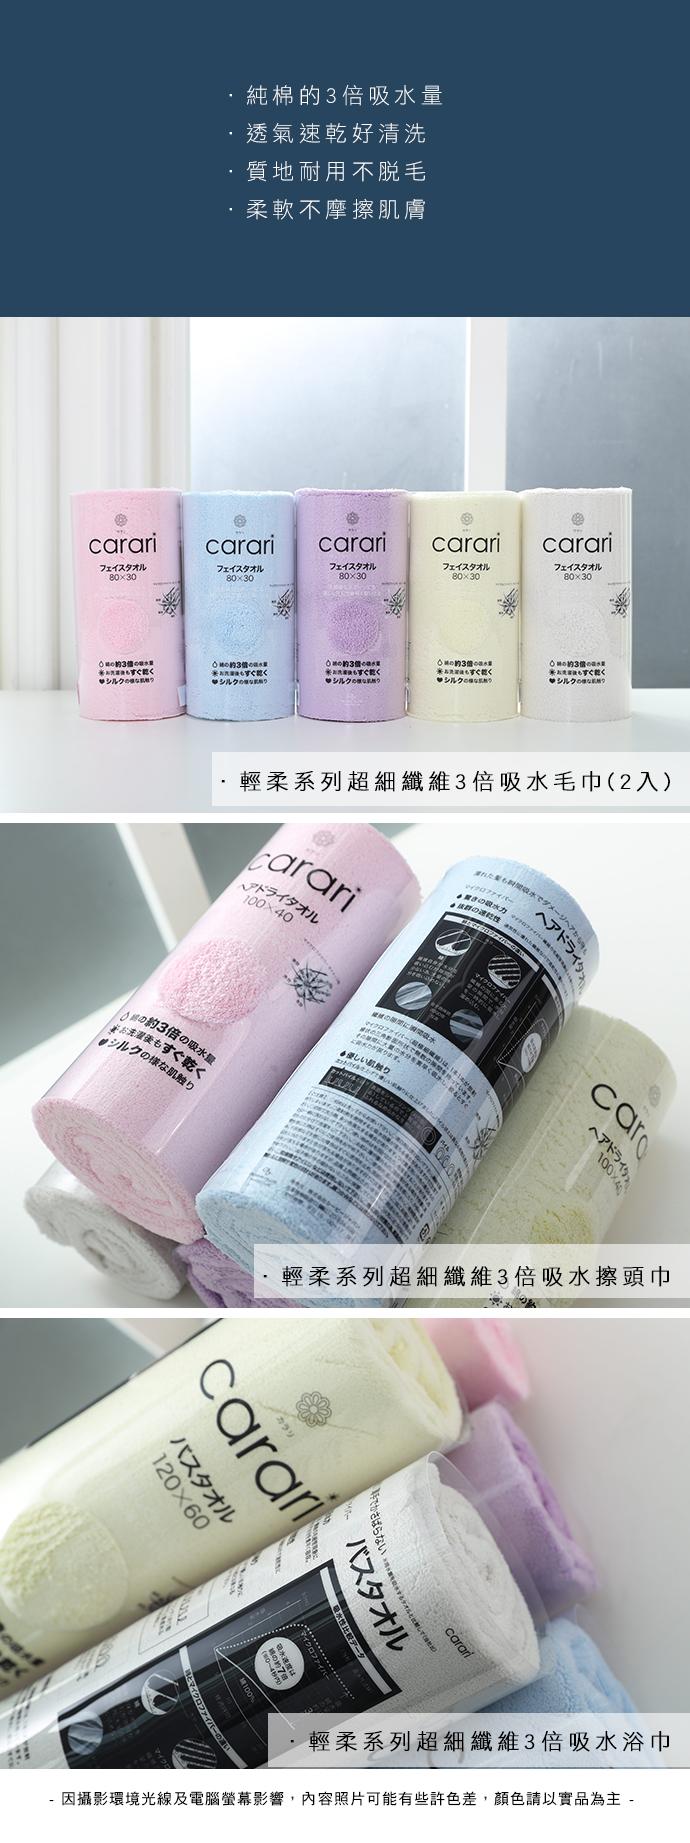 CB Japan 輕柔系列超細纖維3倍吸水毛巾 (2入) - 甜心藍